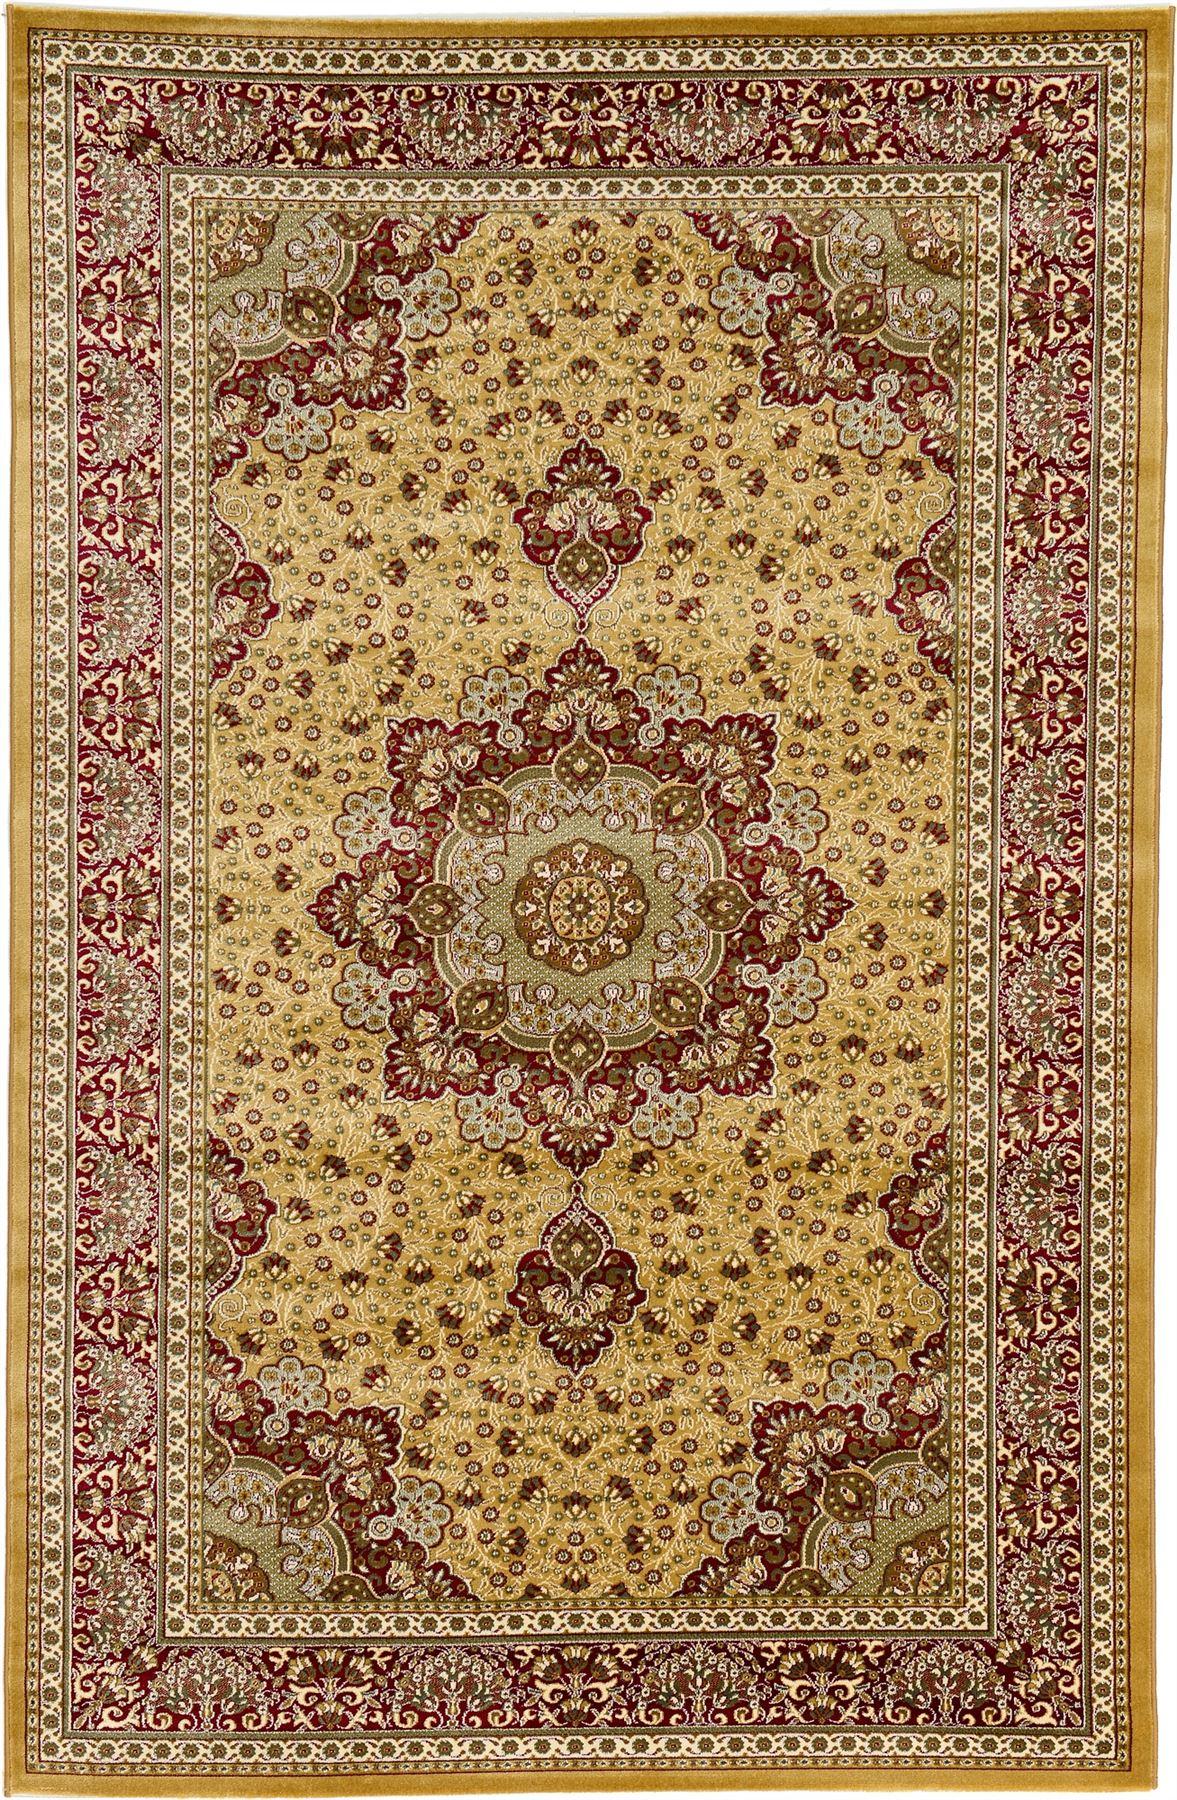 Persian 6 5 X 9 6 Kashan Design Rug Traditional Area